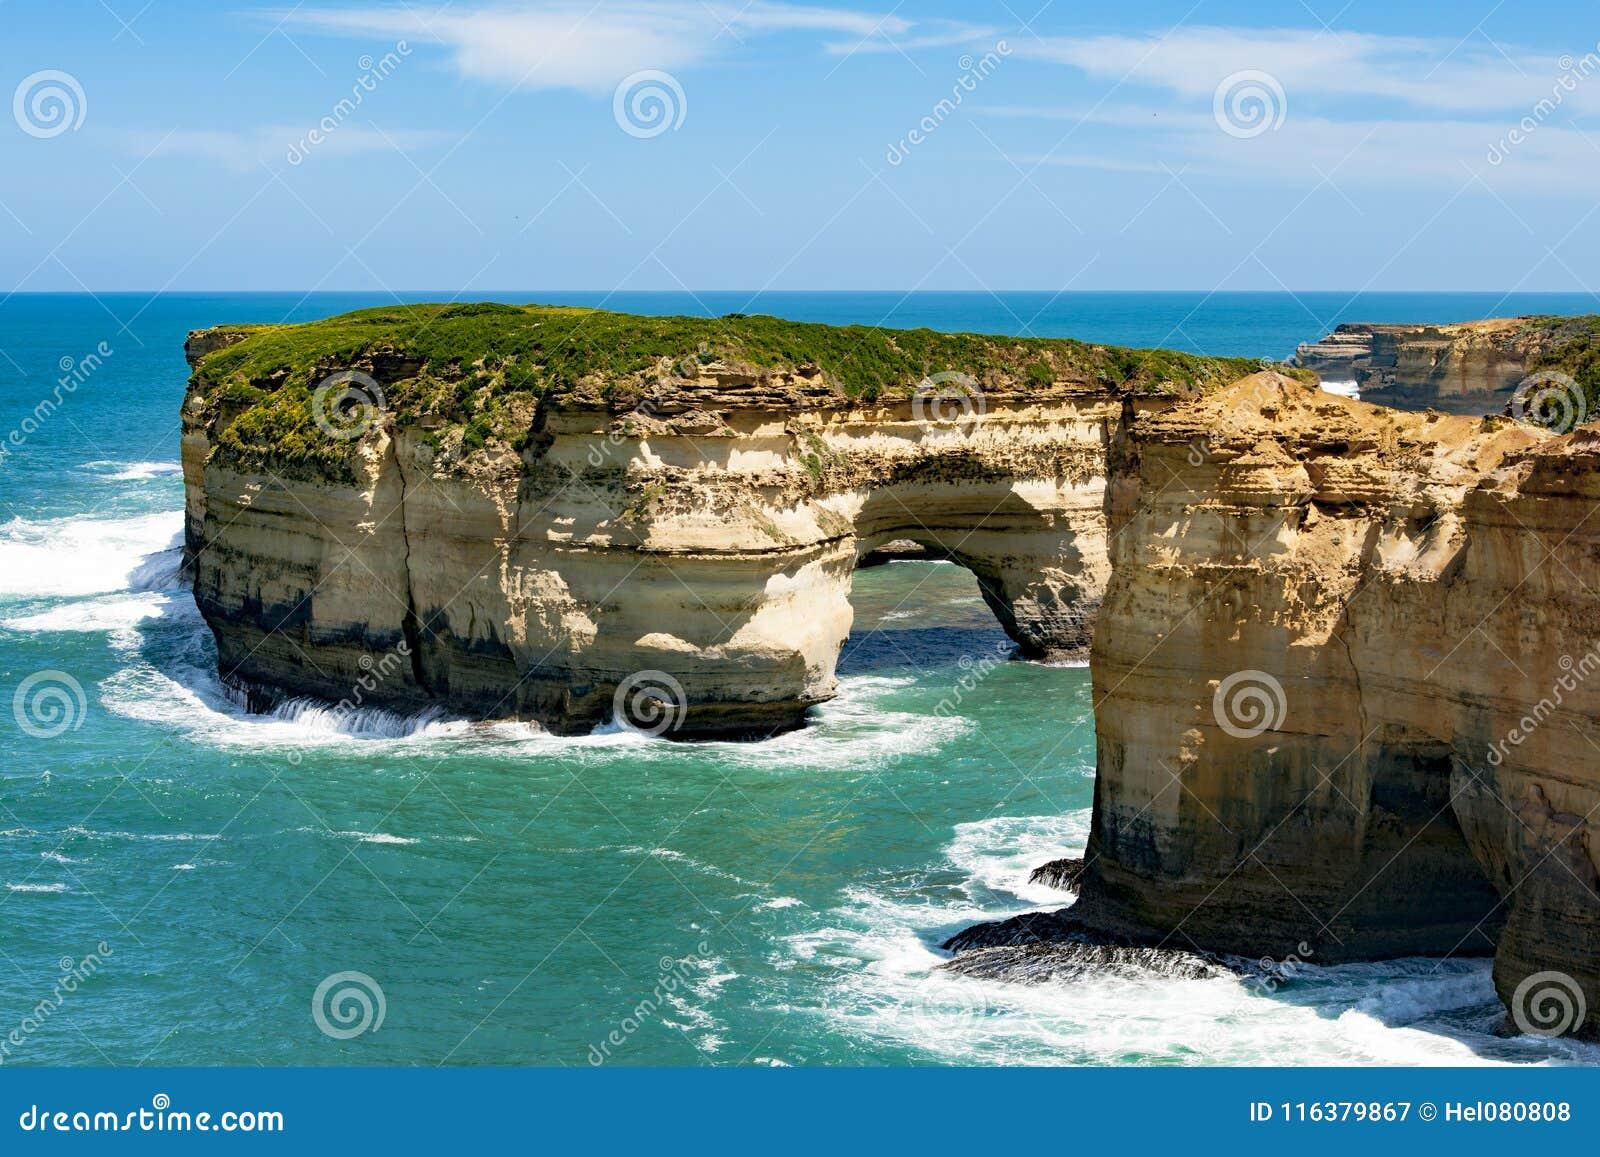 Rock Formations in bay Twelve Apostles, Australia, morning light at rock formation Twelve Apostles